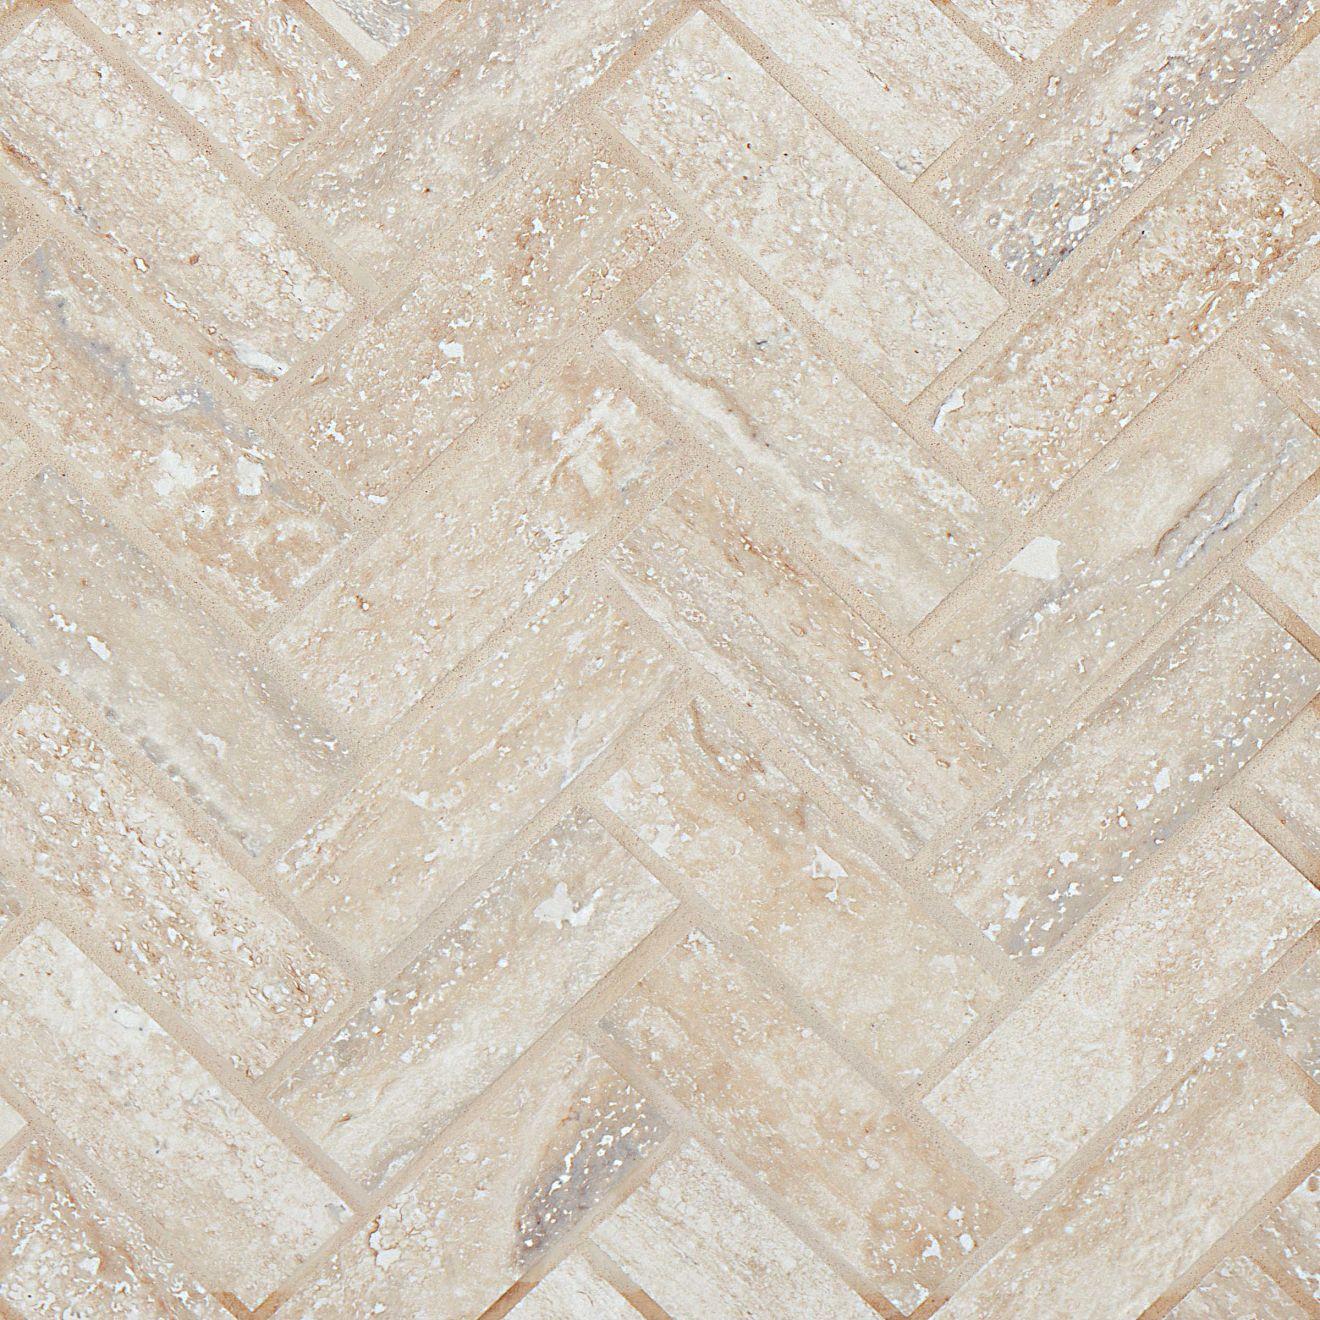 "Toscano 1"" x 4"" Floor & Wall Mosaic in Silver"